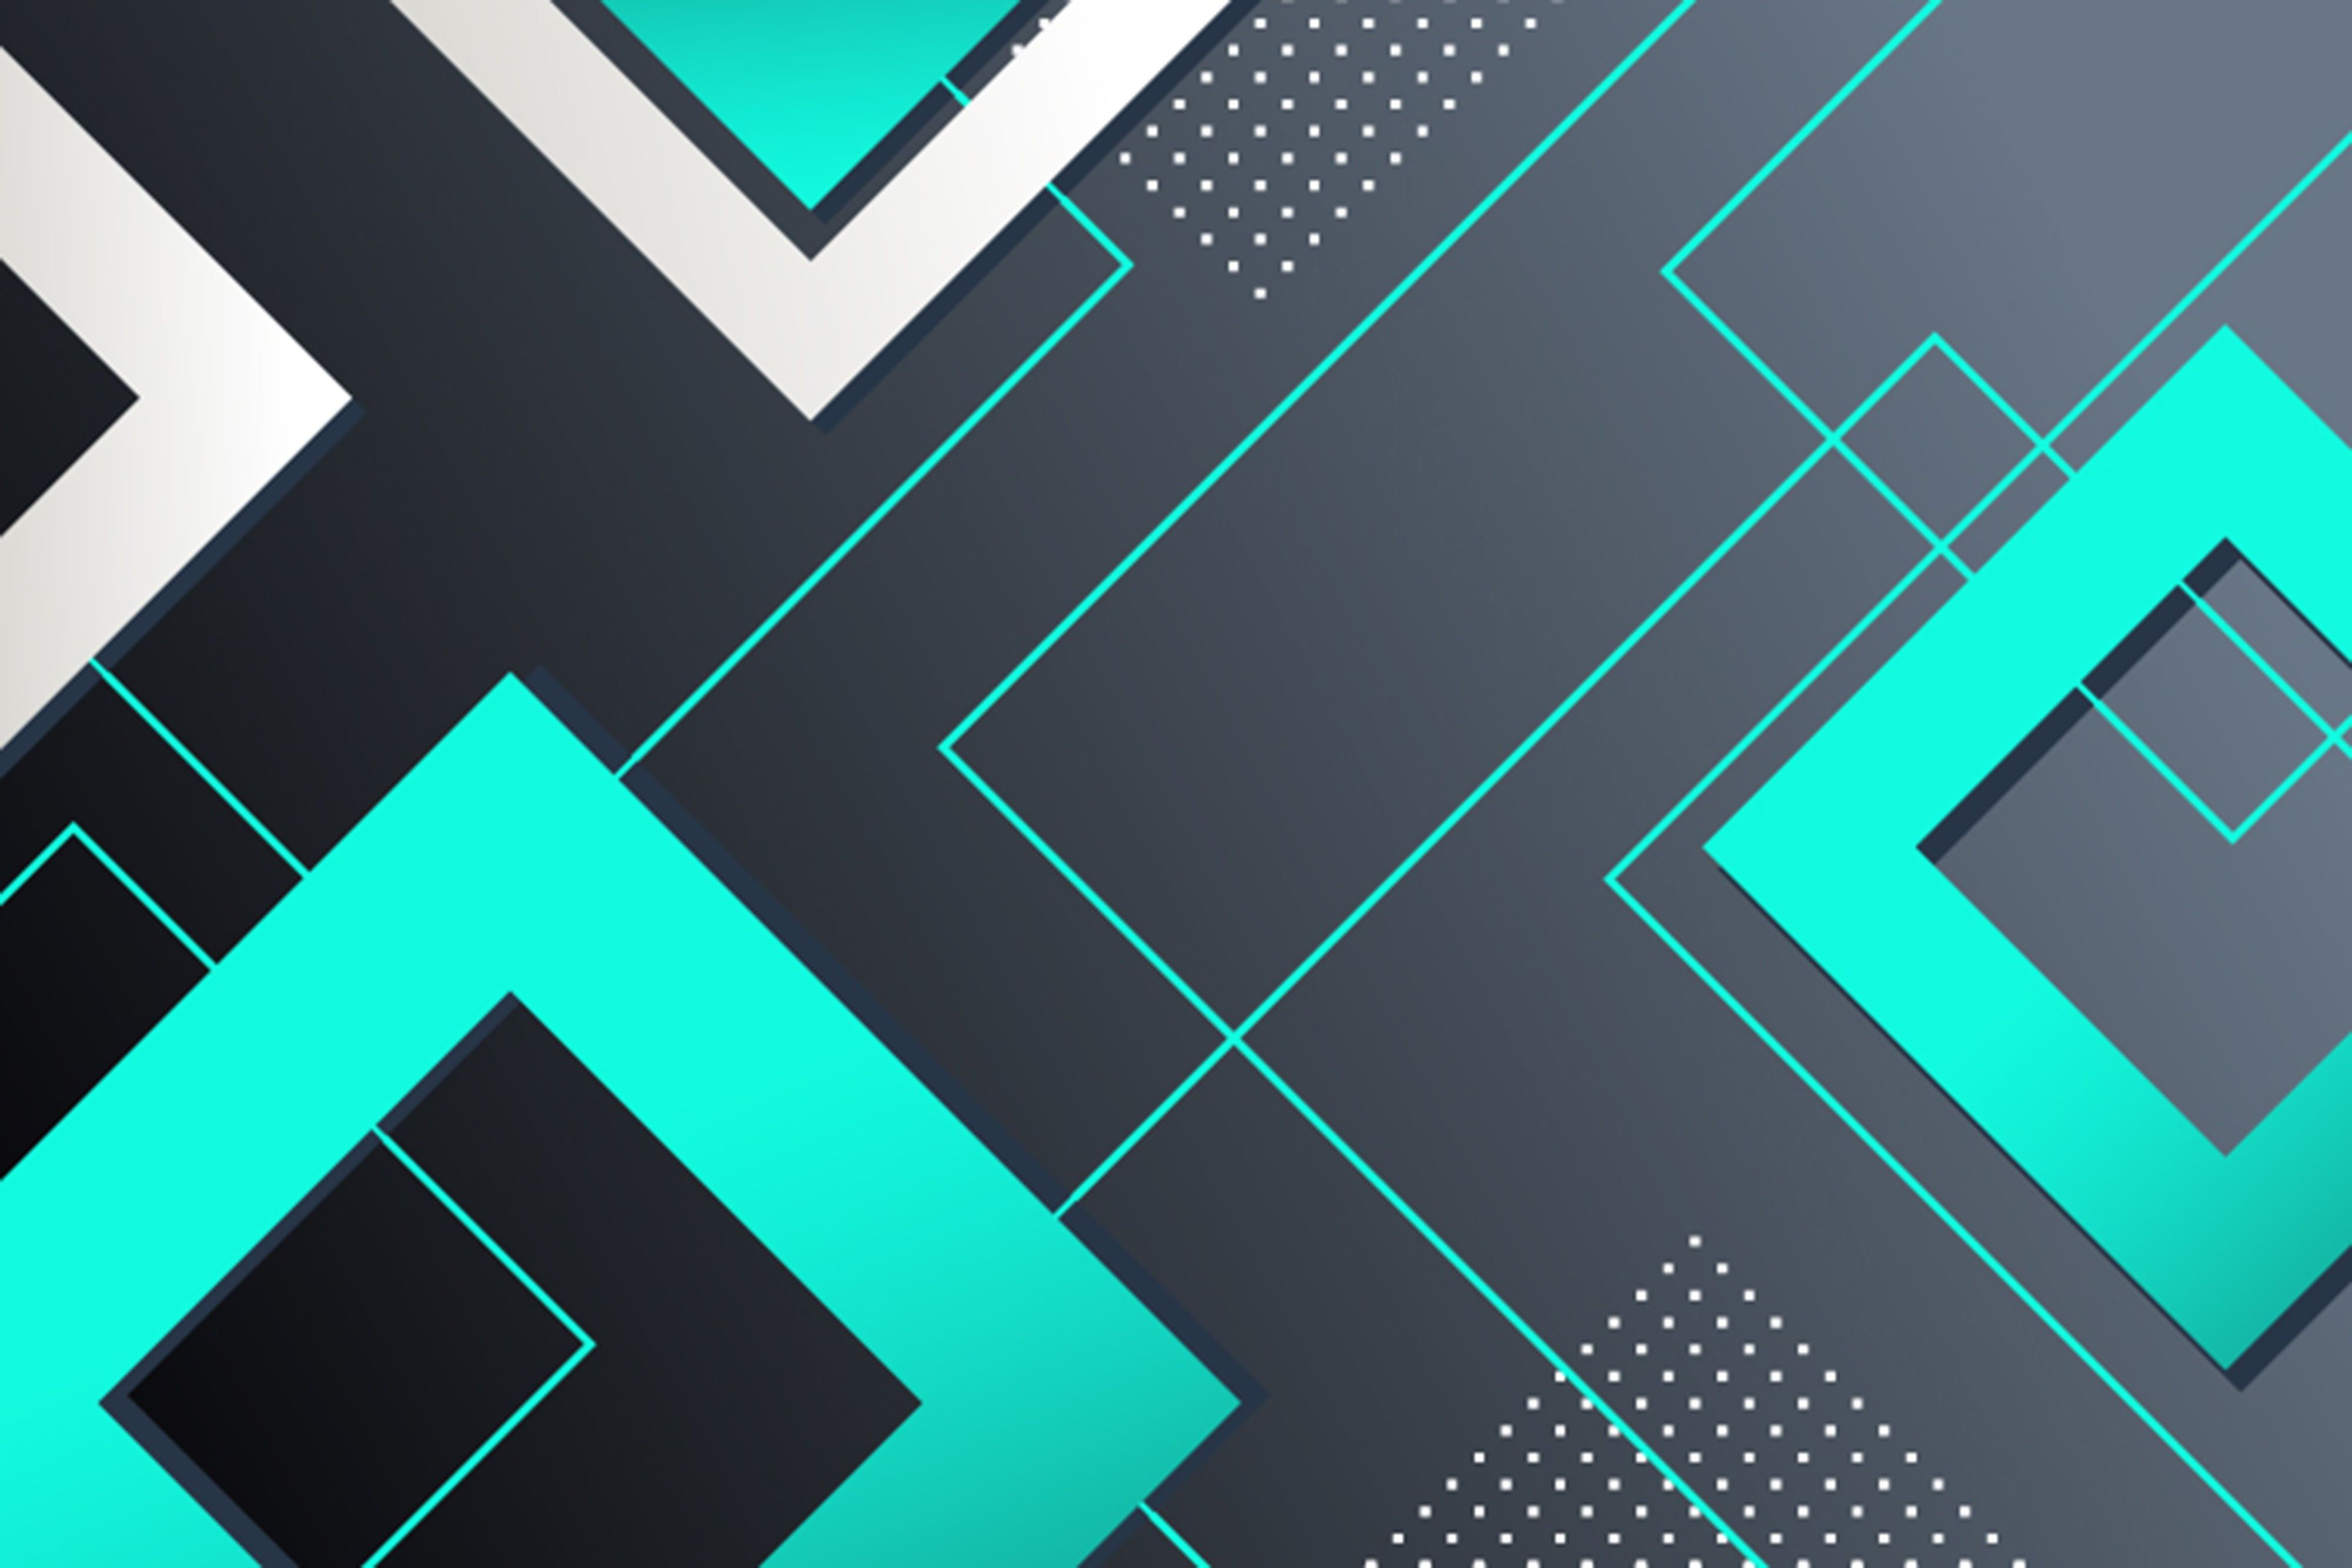 Line Background Abstract Background Geometric 4k Wallpaper Hdwallpaper Desktop In 2021 Graphic Wallpaper Hd Wallpaper Black And Blue Wallpaper